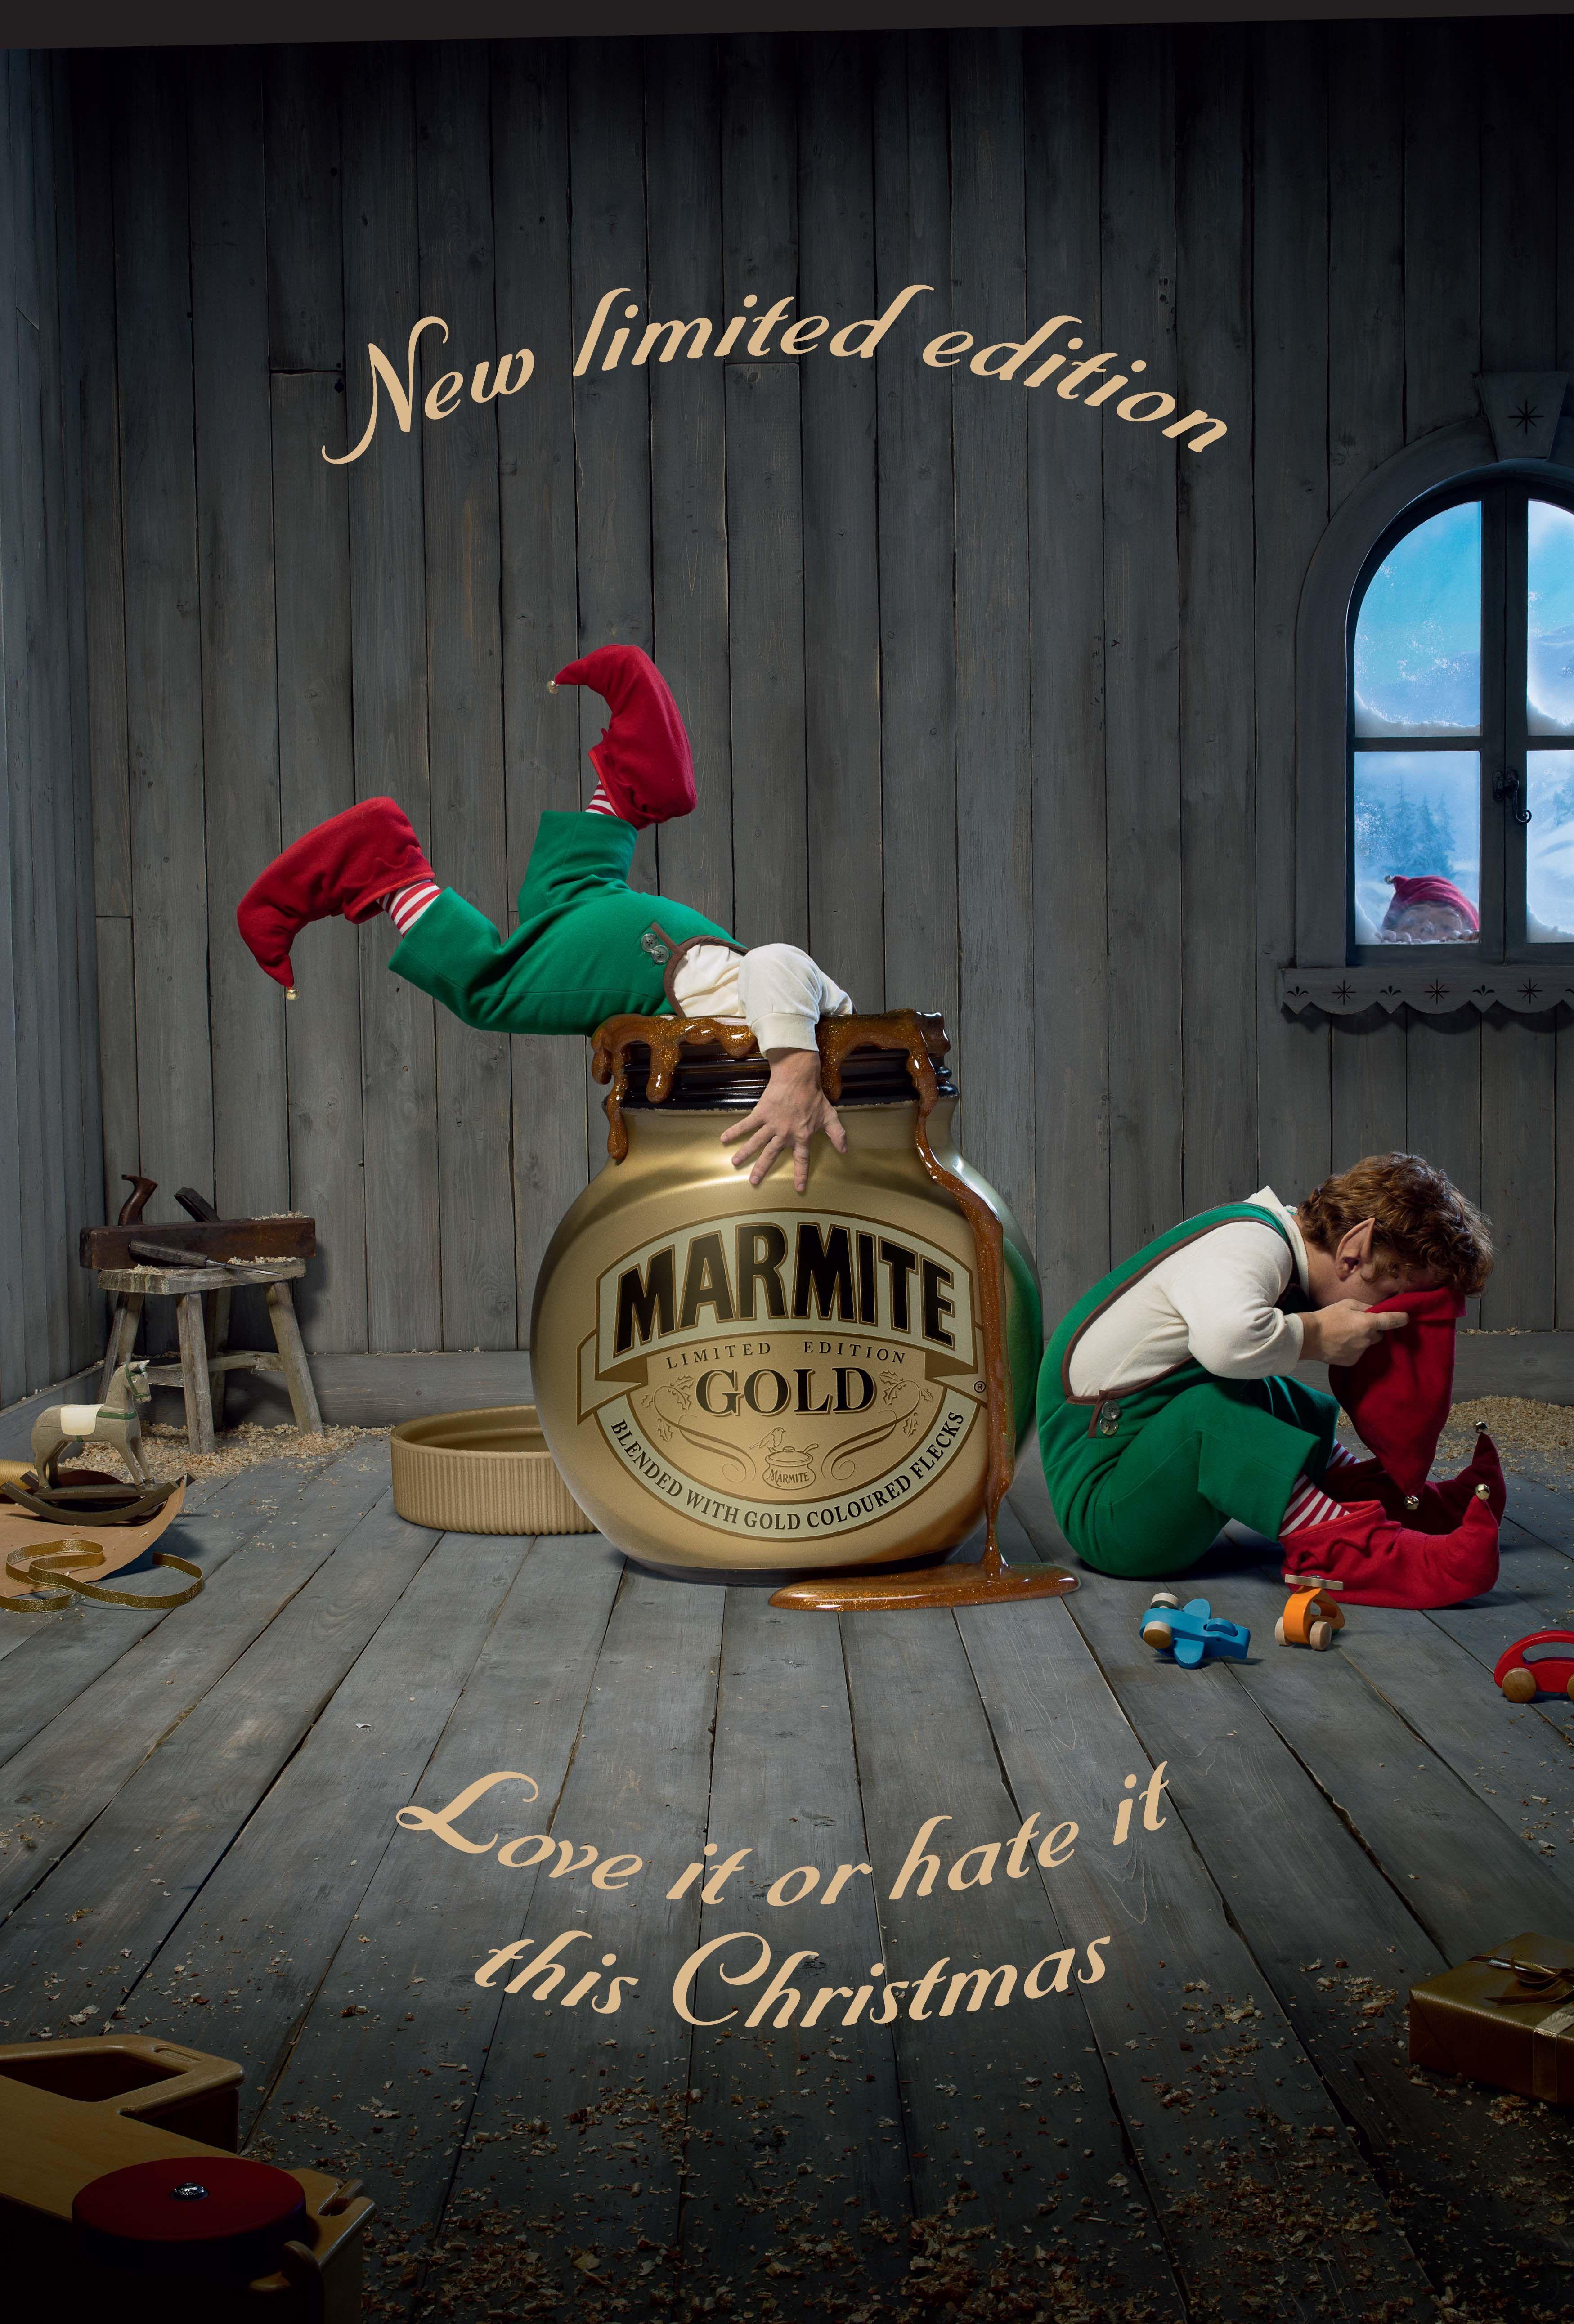 Limited edition Marmite from Adam & Eve DDB London.